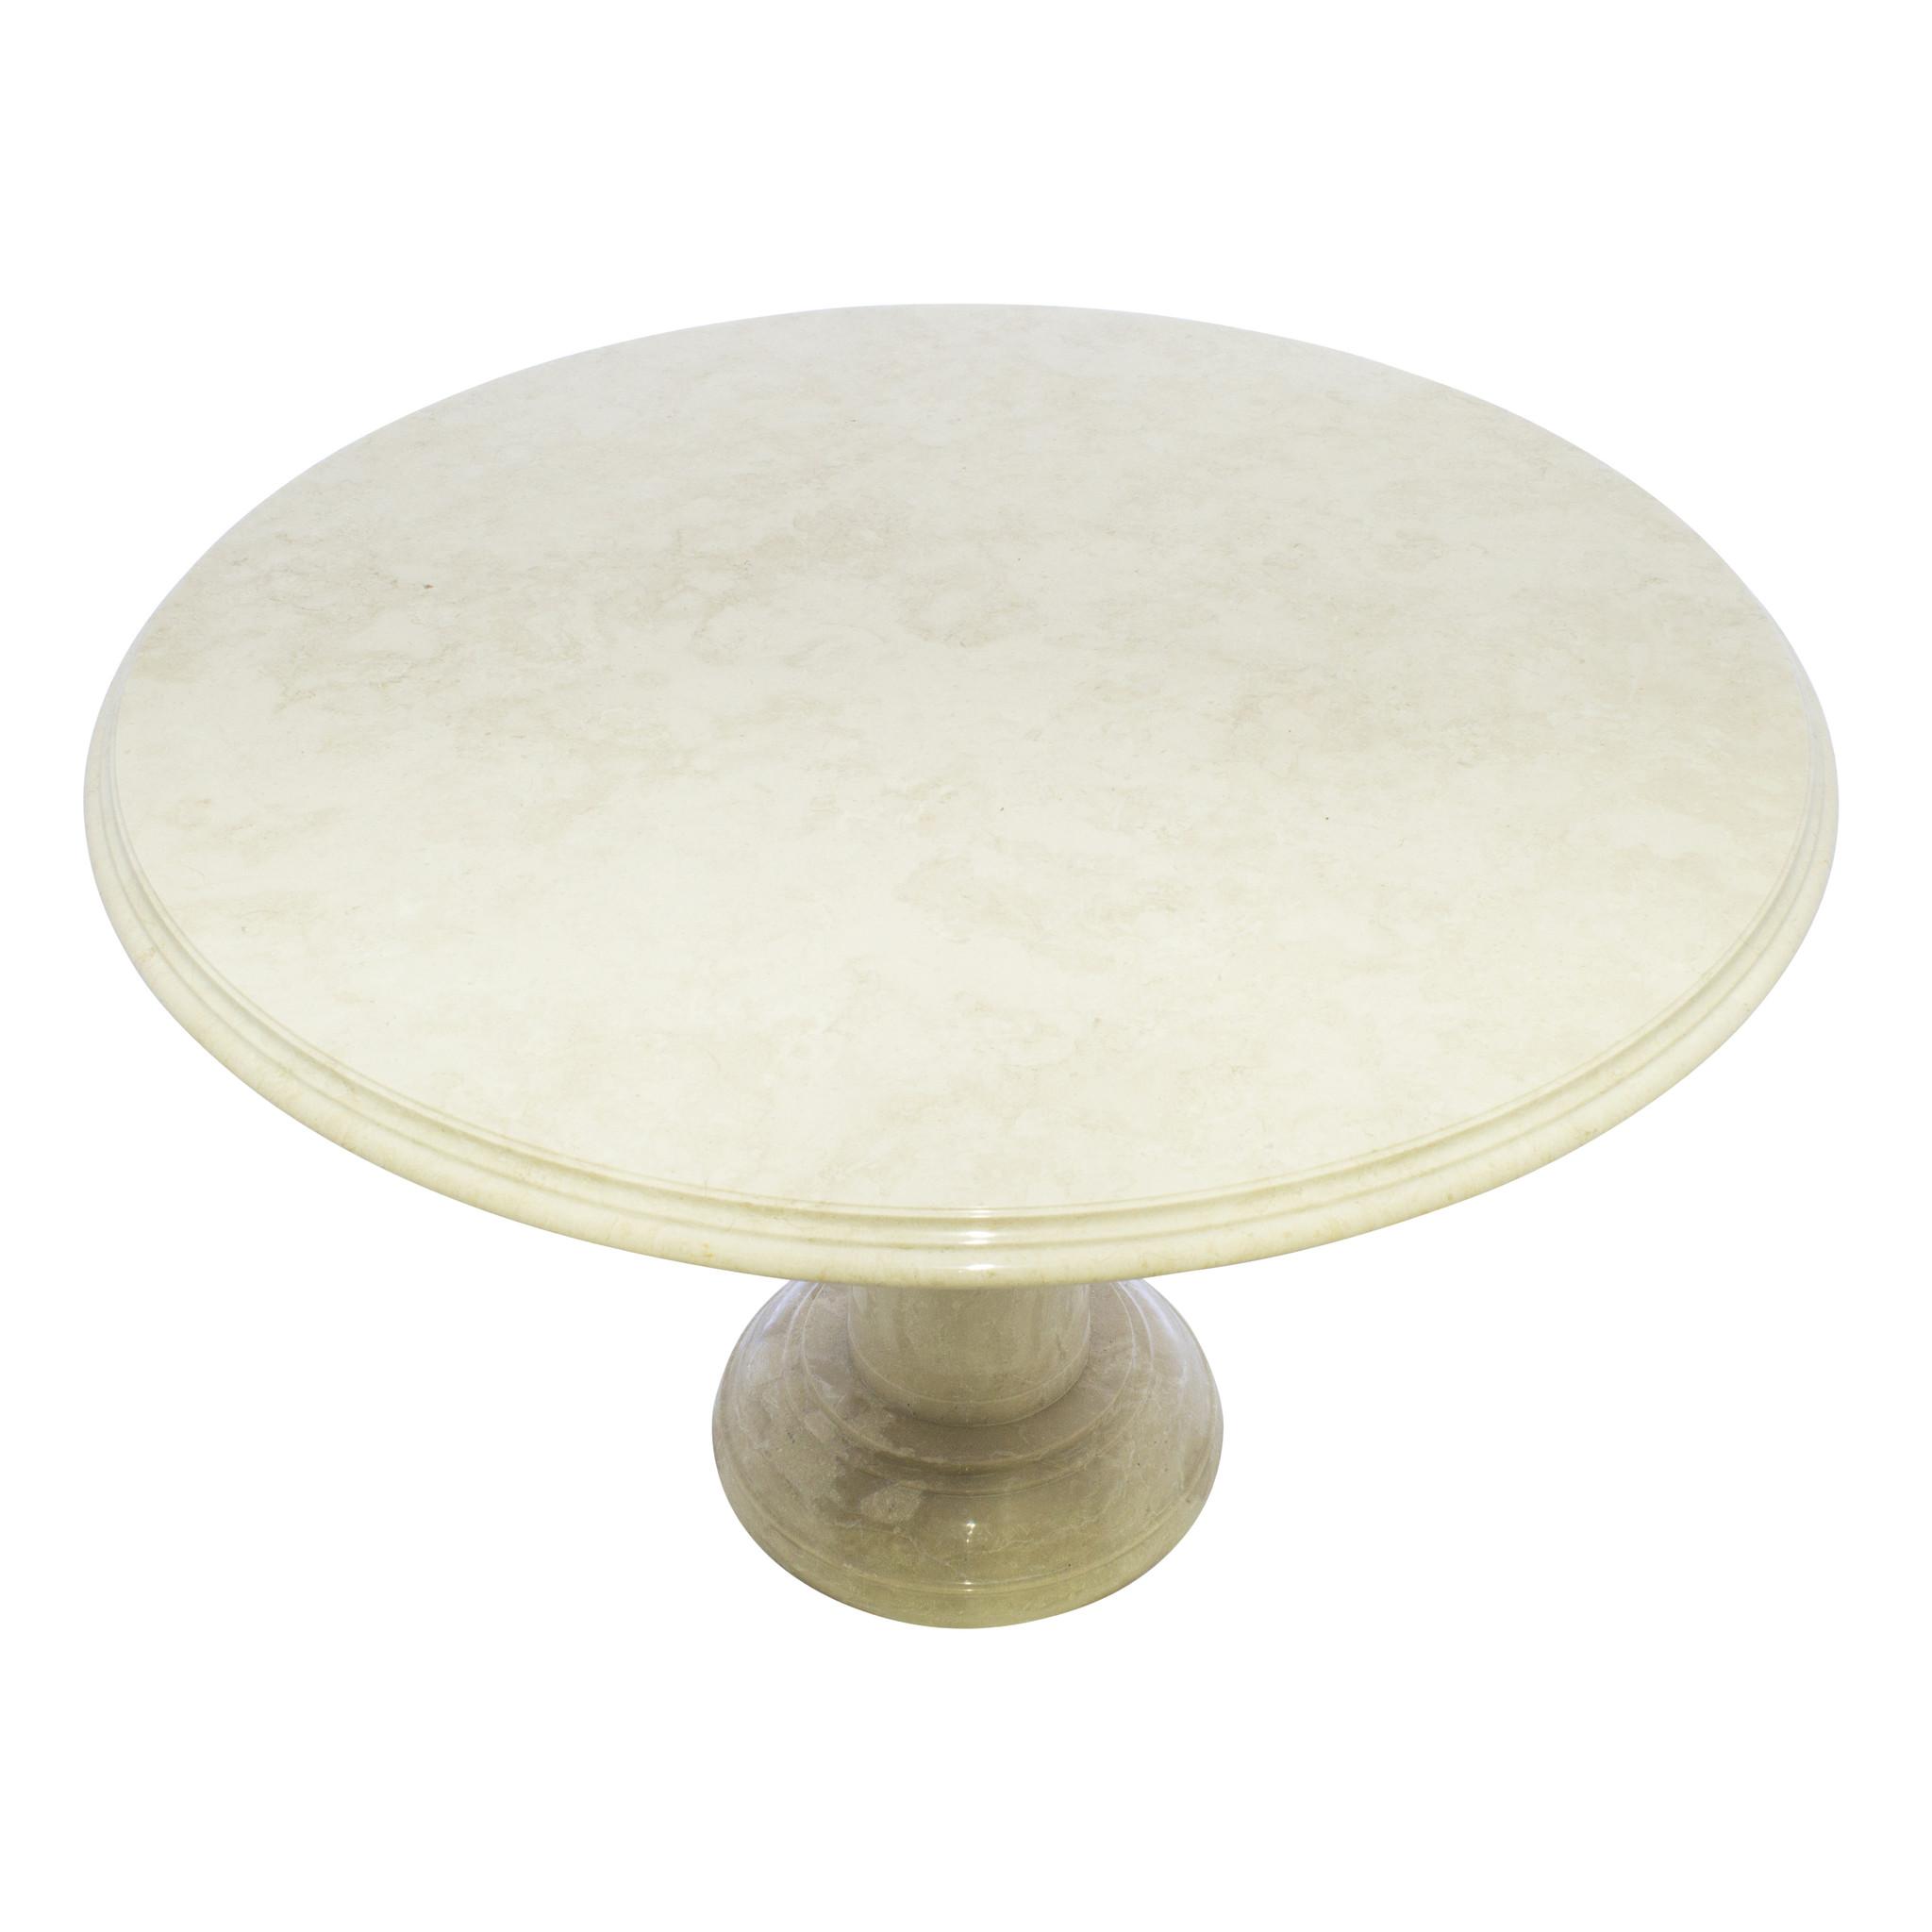 Indomarmer Eettafel Rond Ø120xH79 cm Crème Marmer